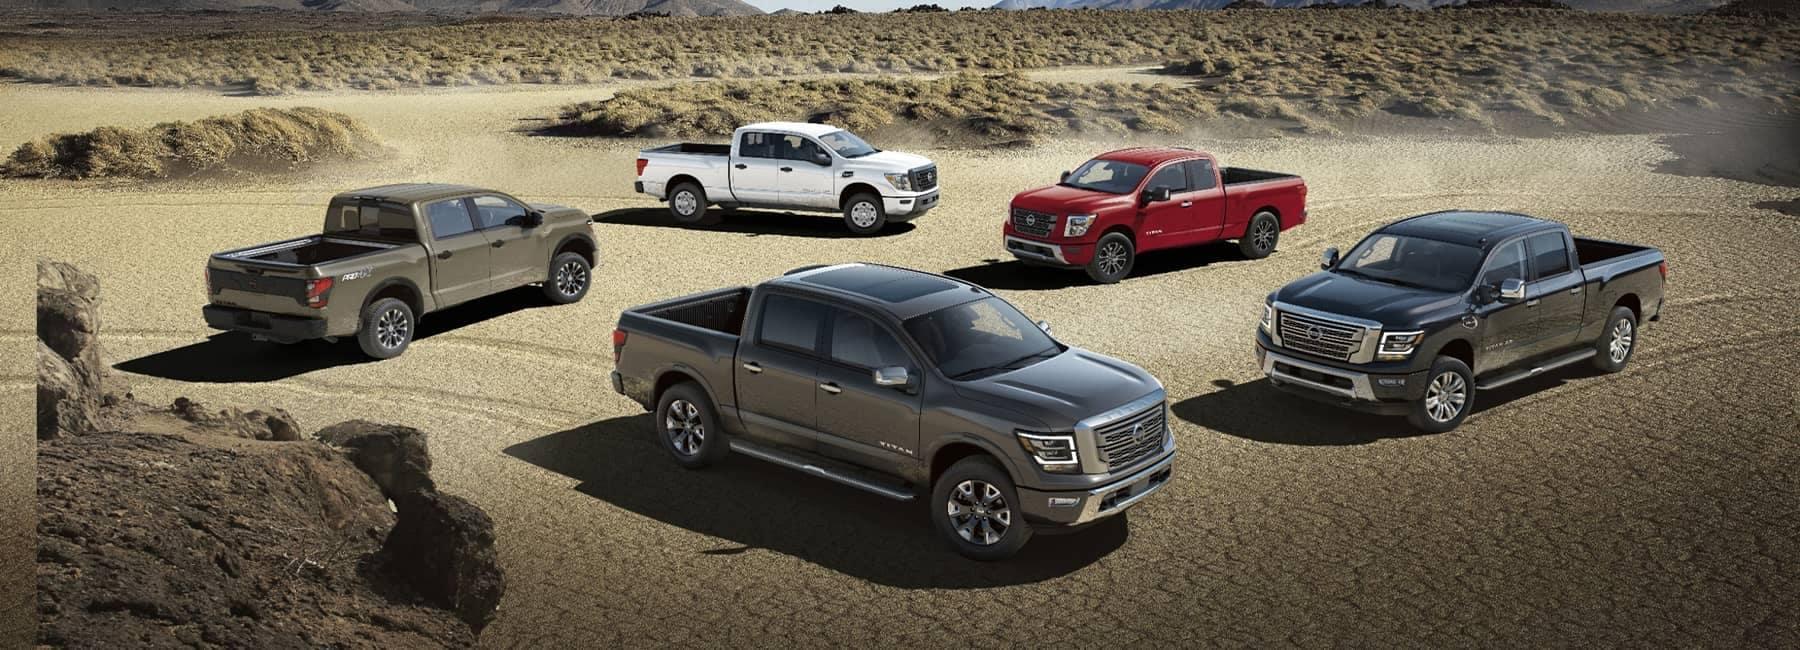 2021 Nissan Lineup of Pickup Trucks